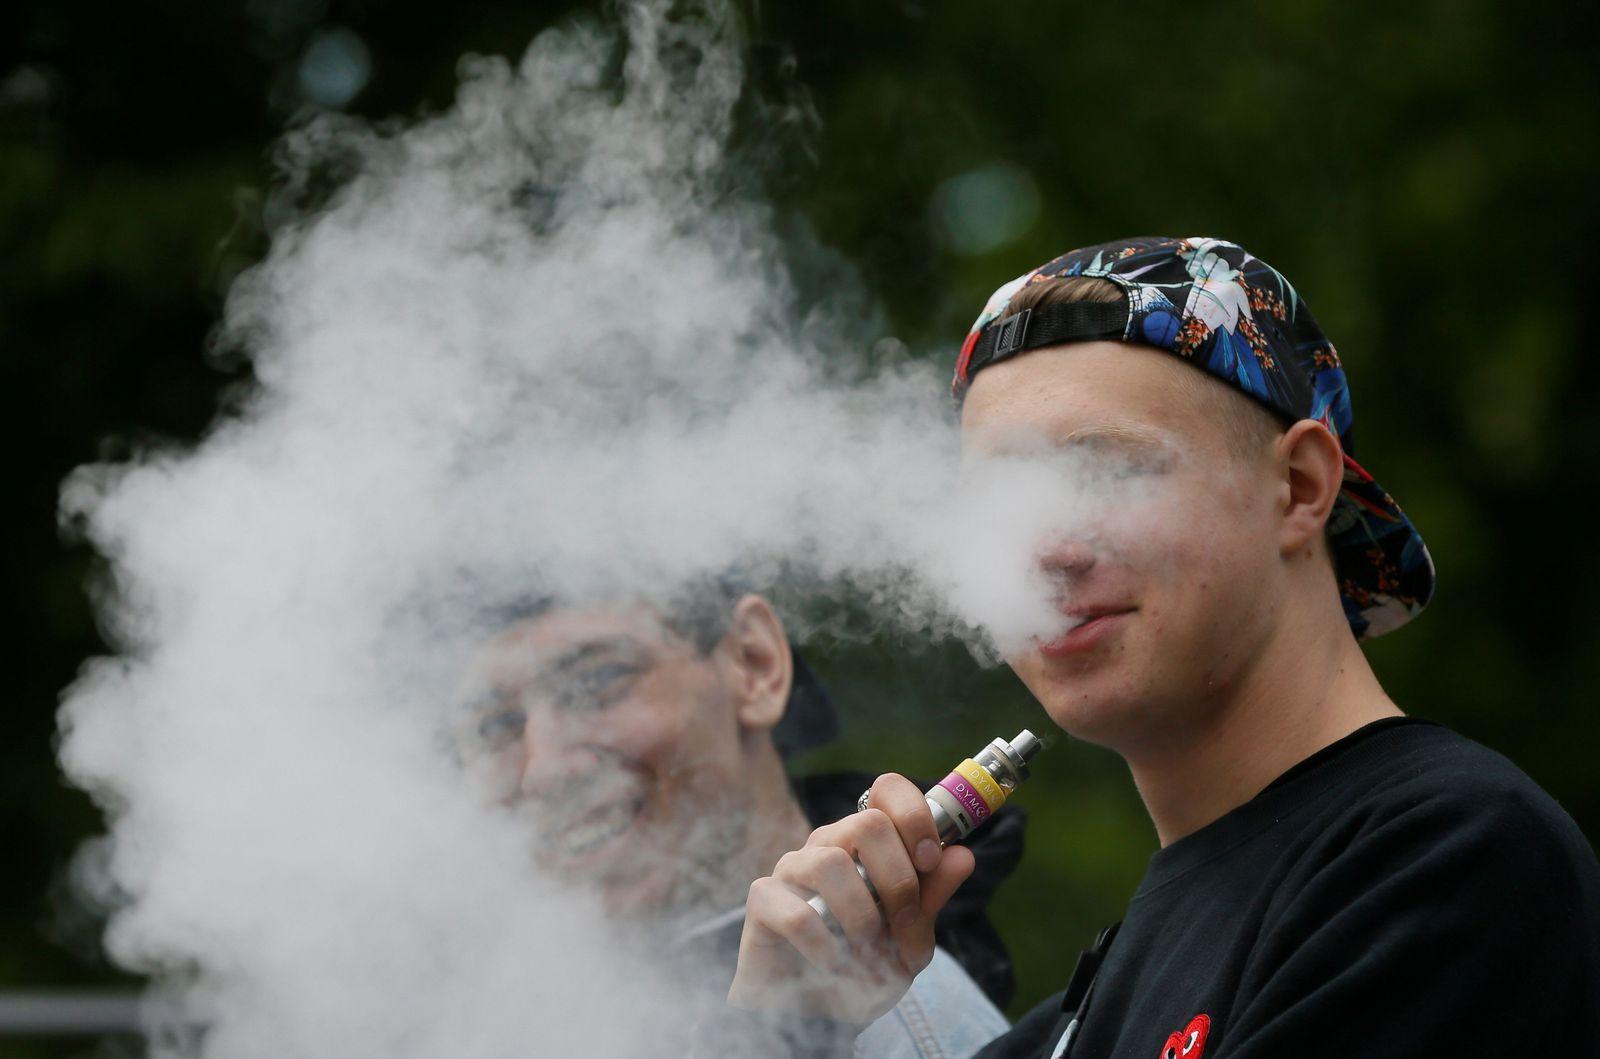 E-Zigarette / Raucher / Jugendliche